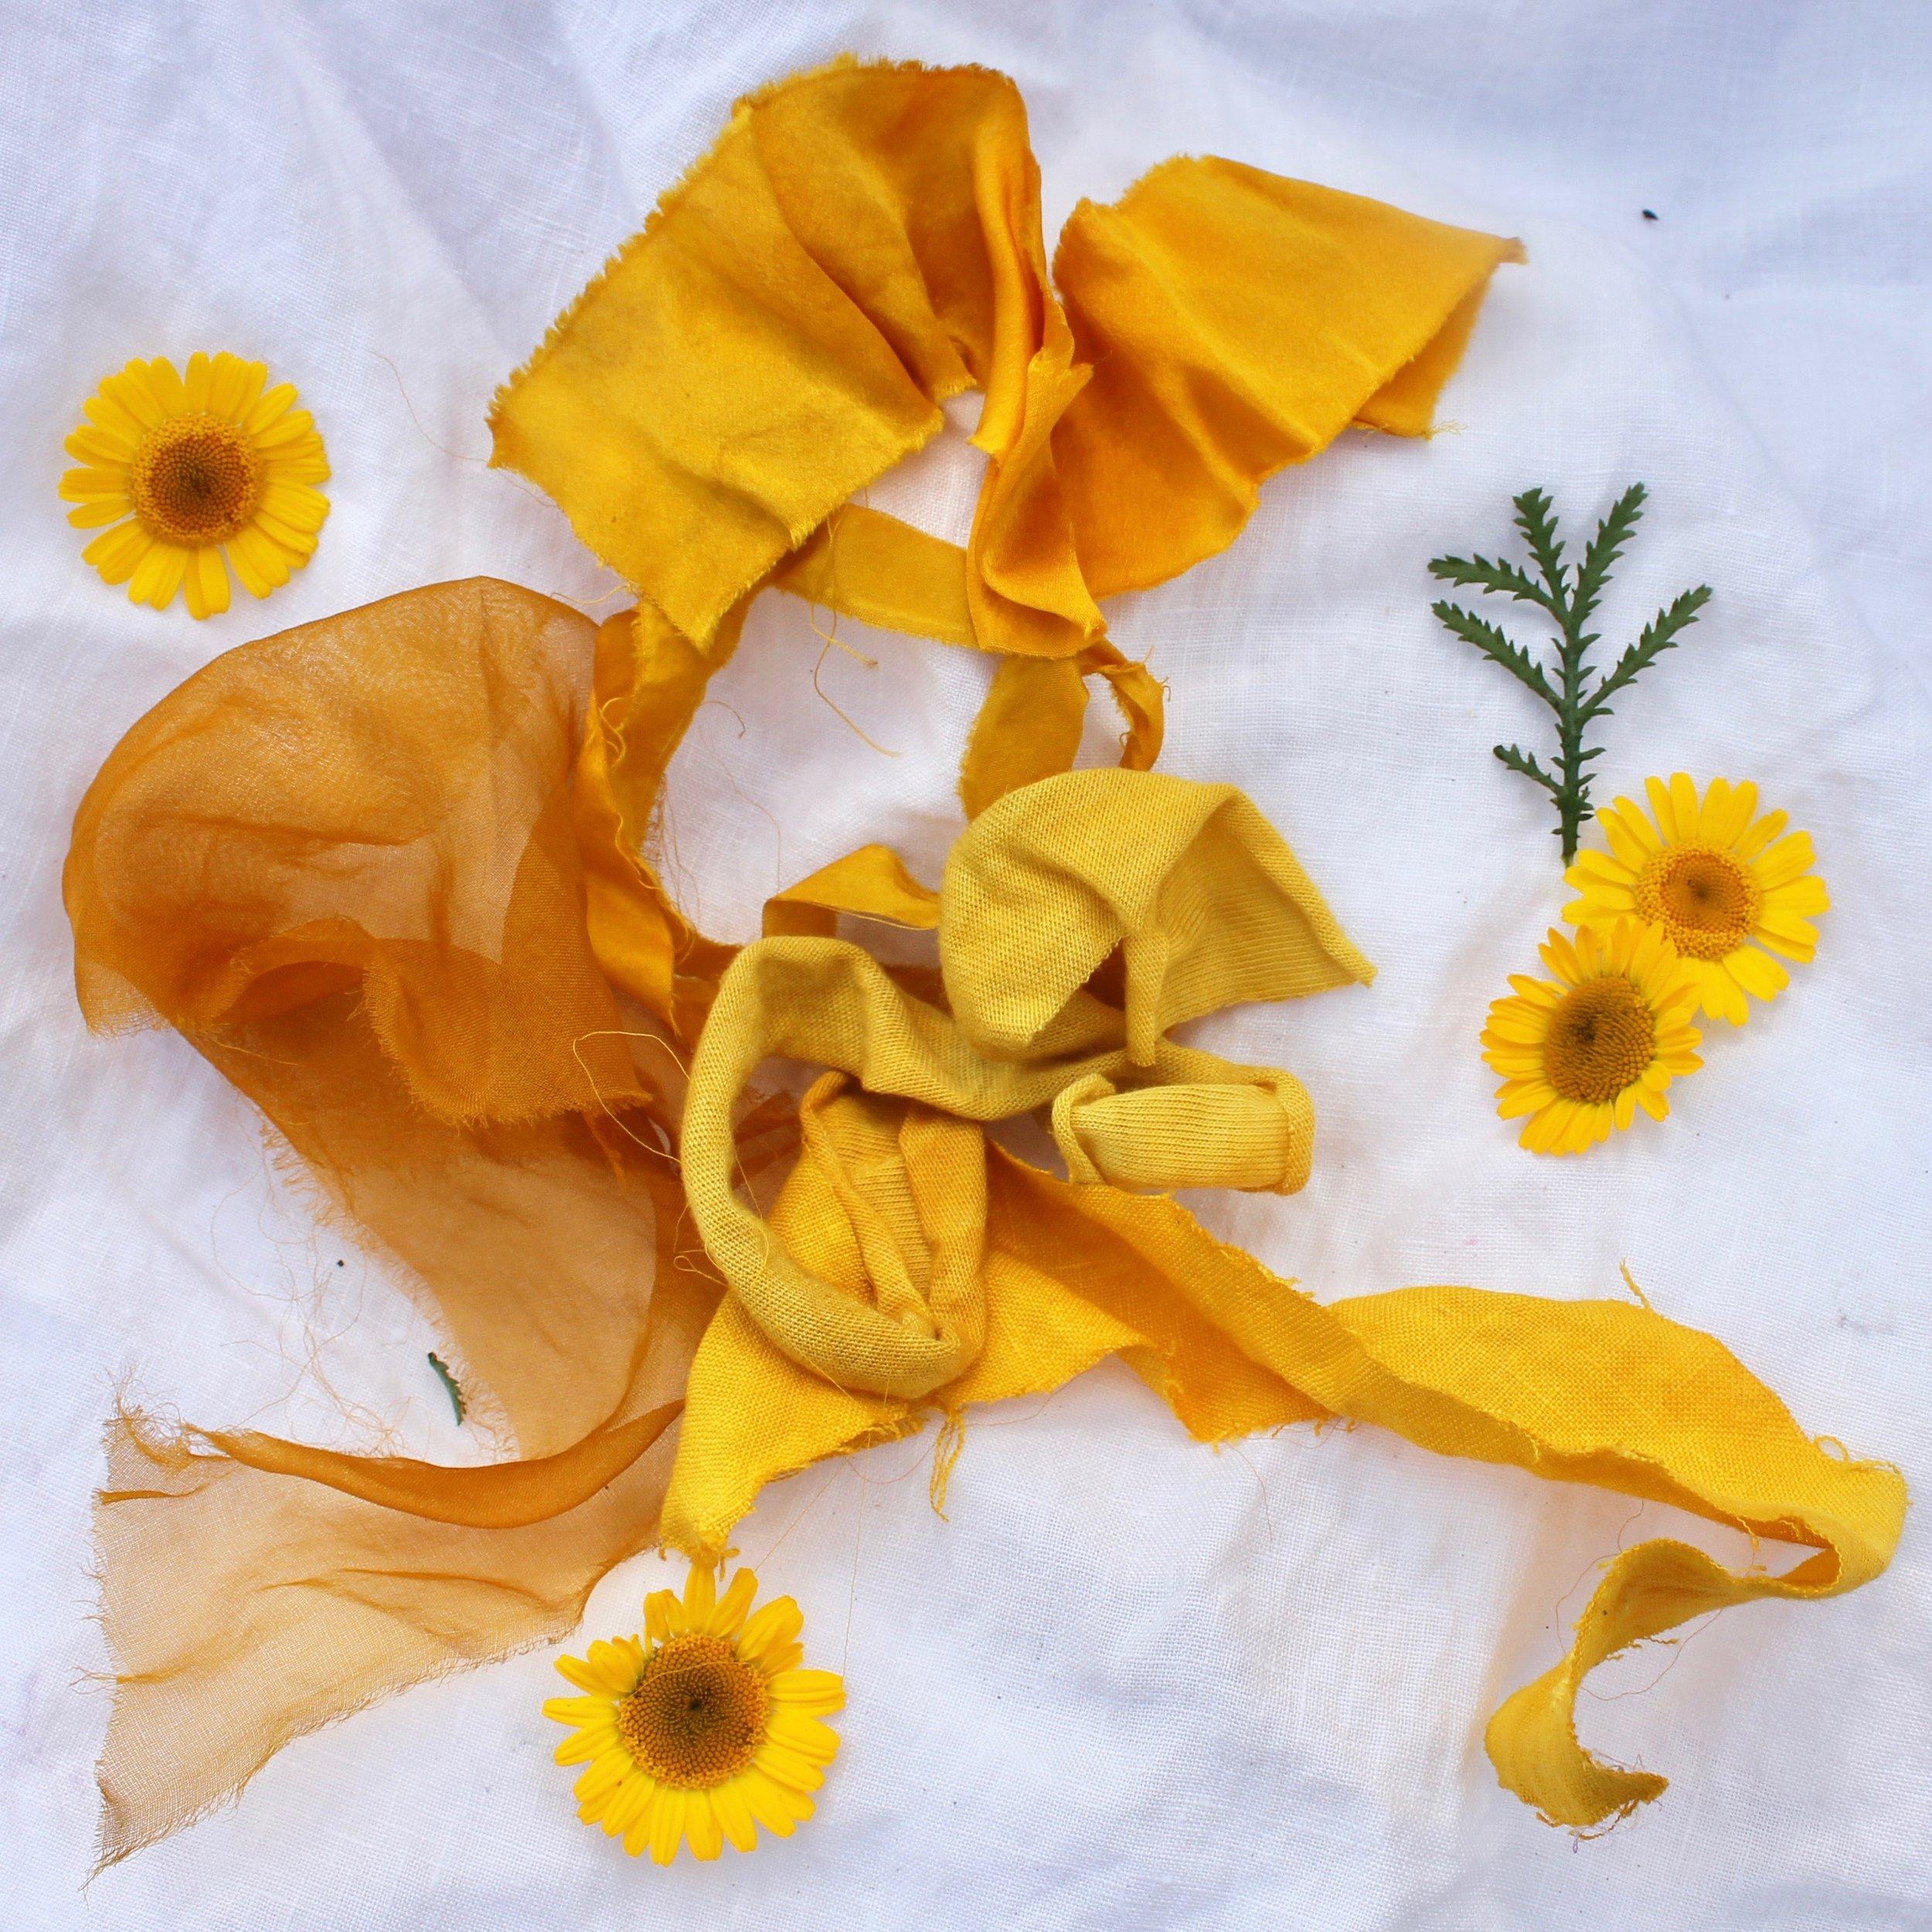 Dyer's Chamomile  This cheery yellow flower creates bright yellows to mustard yellows.